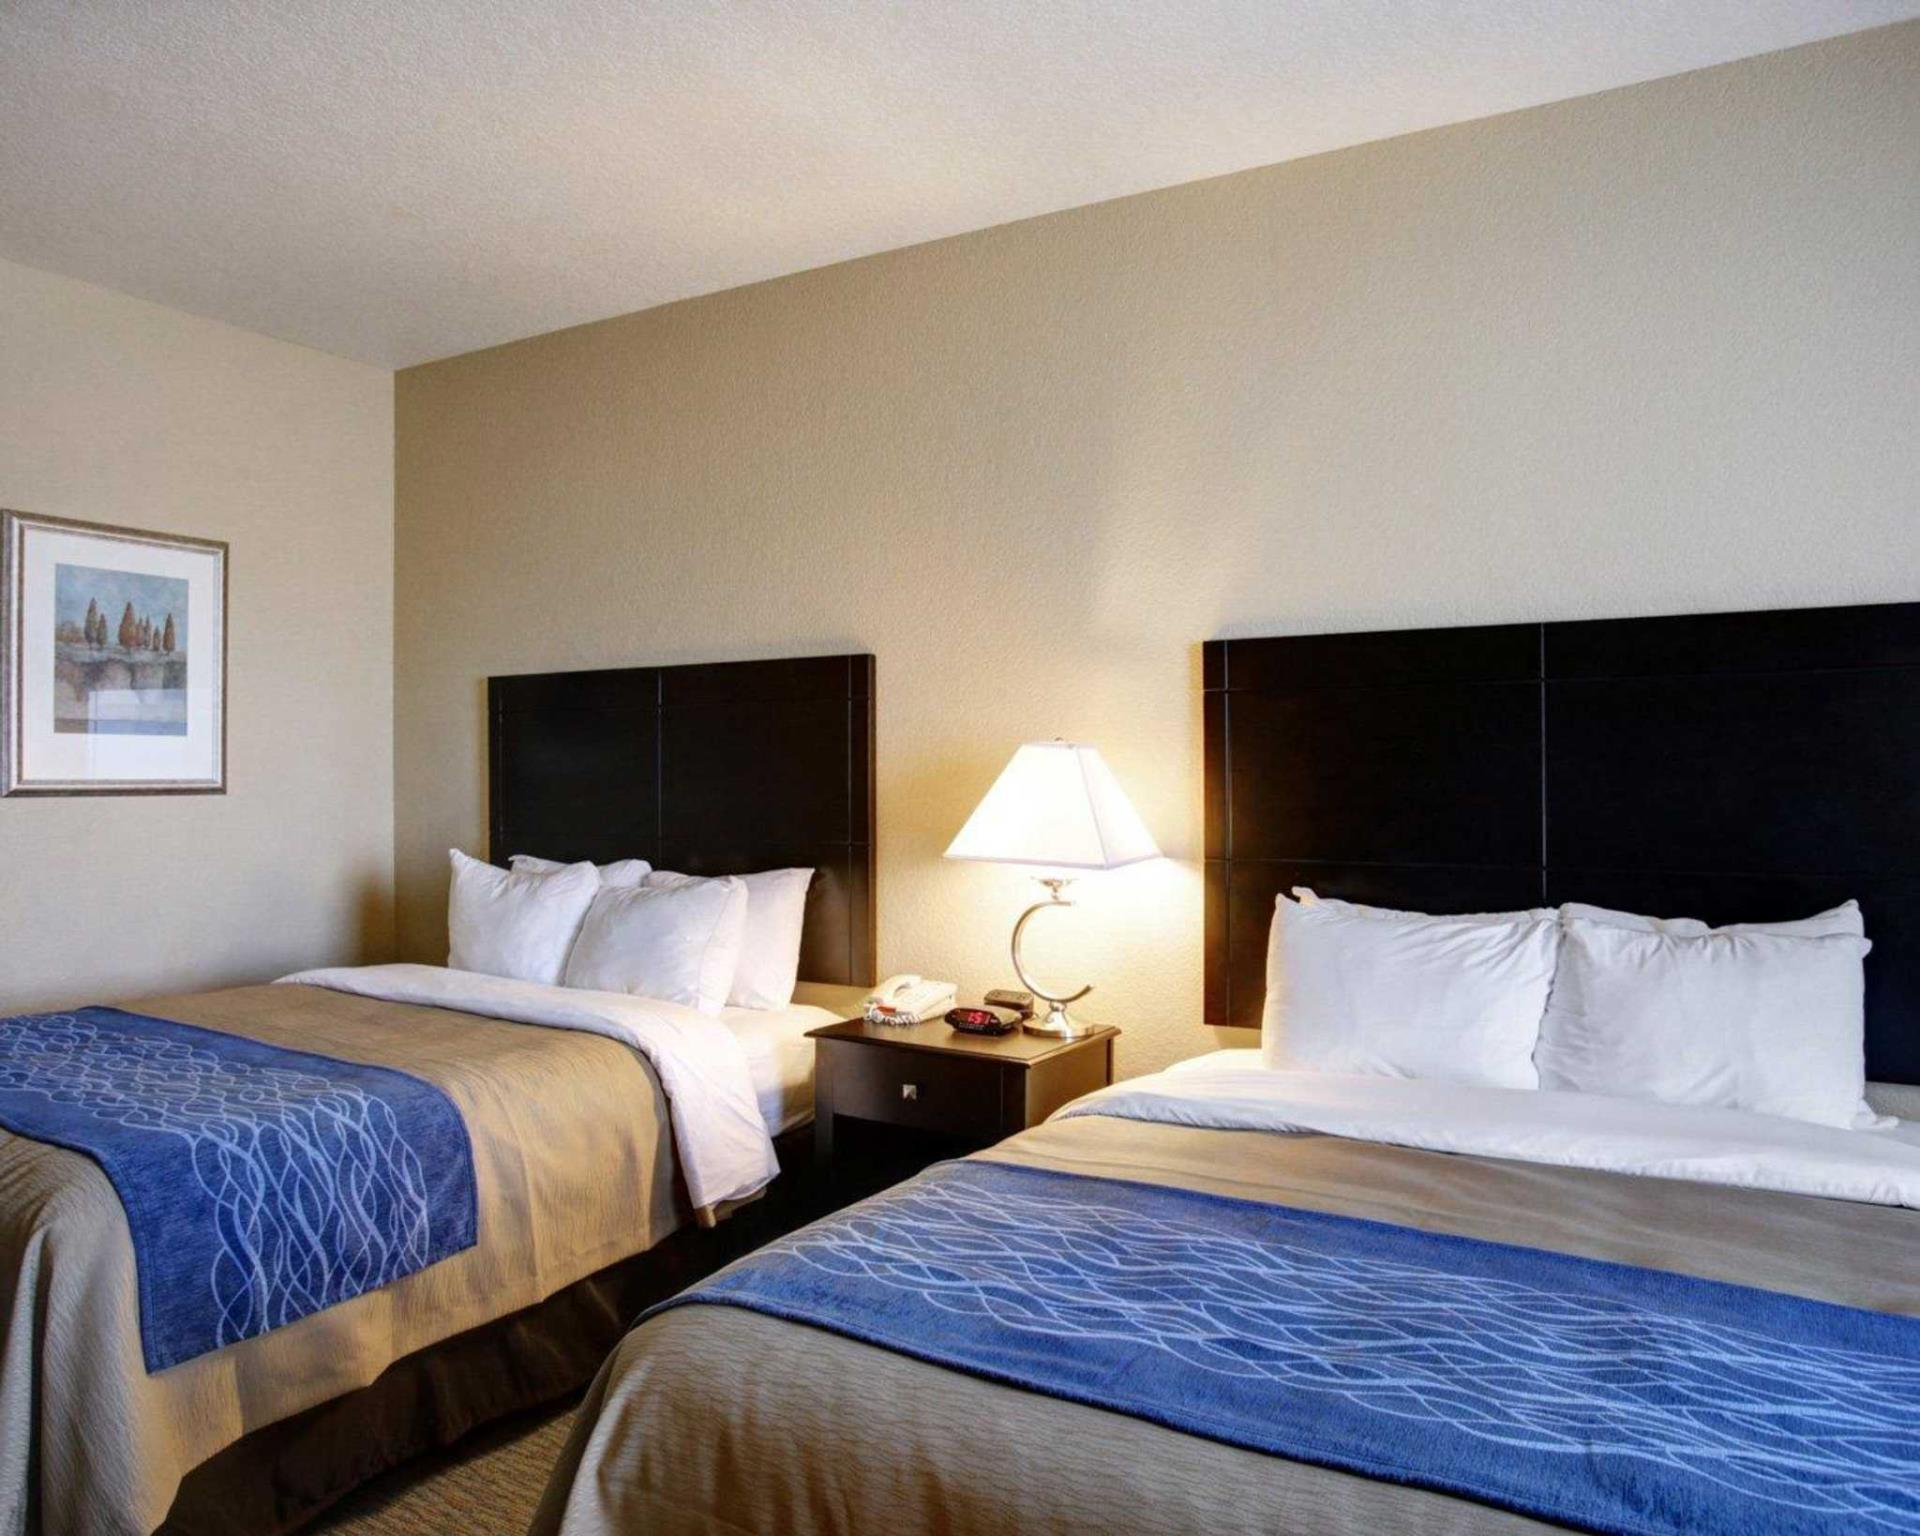 Comfort Inn & Suites Selma near Randolph AFB, Bexar